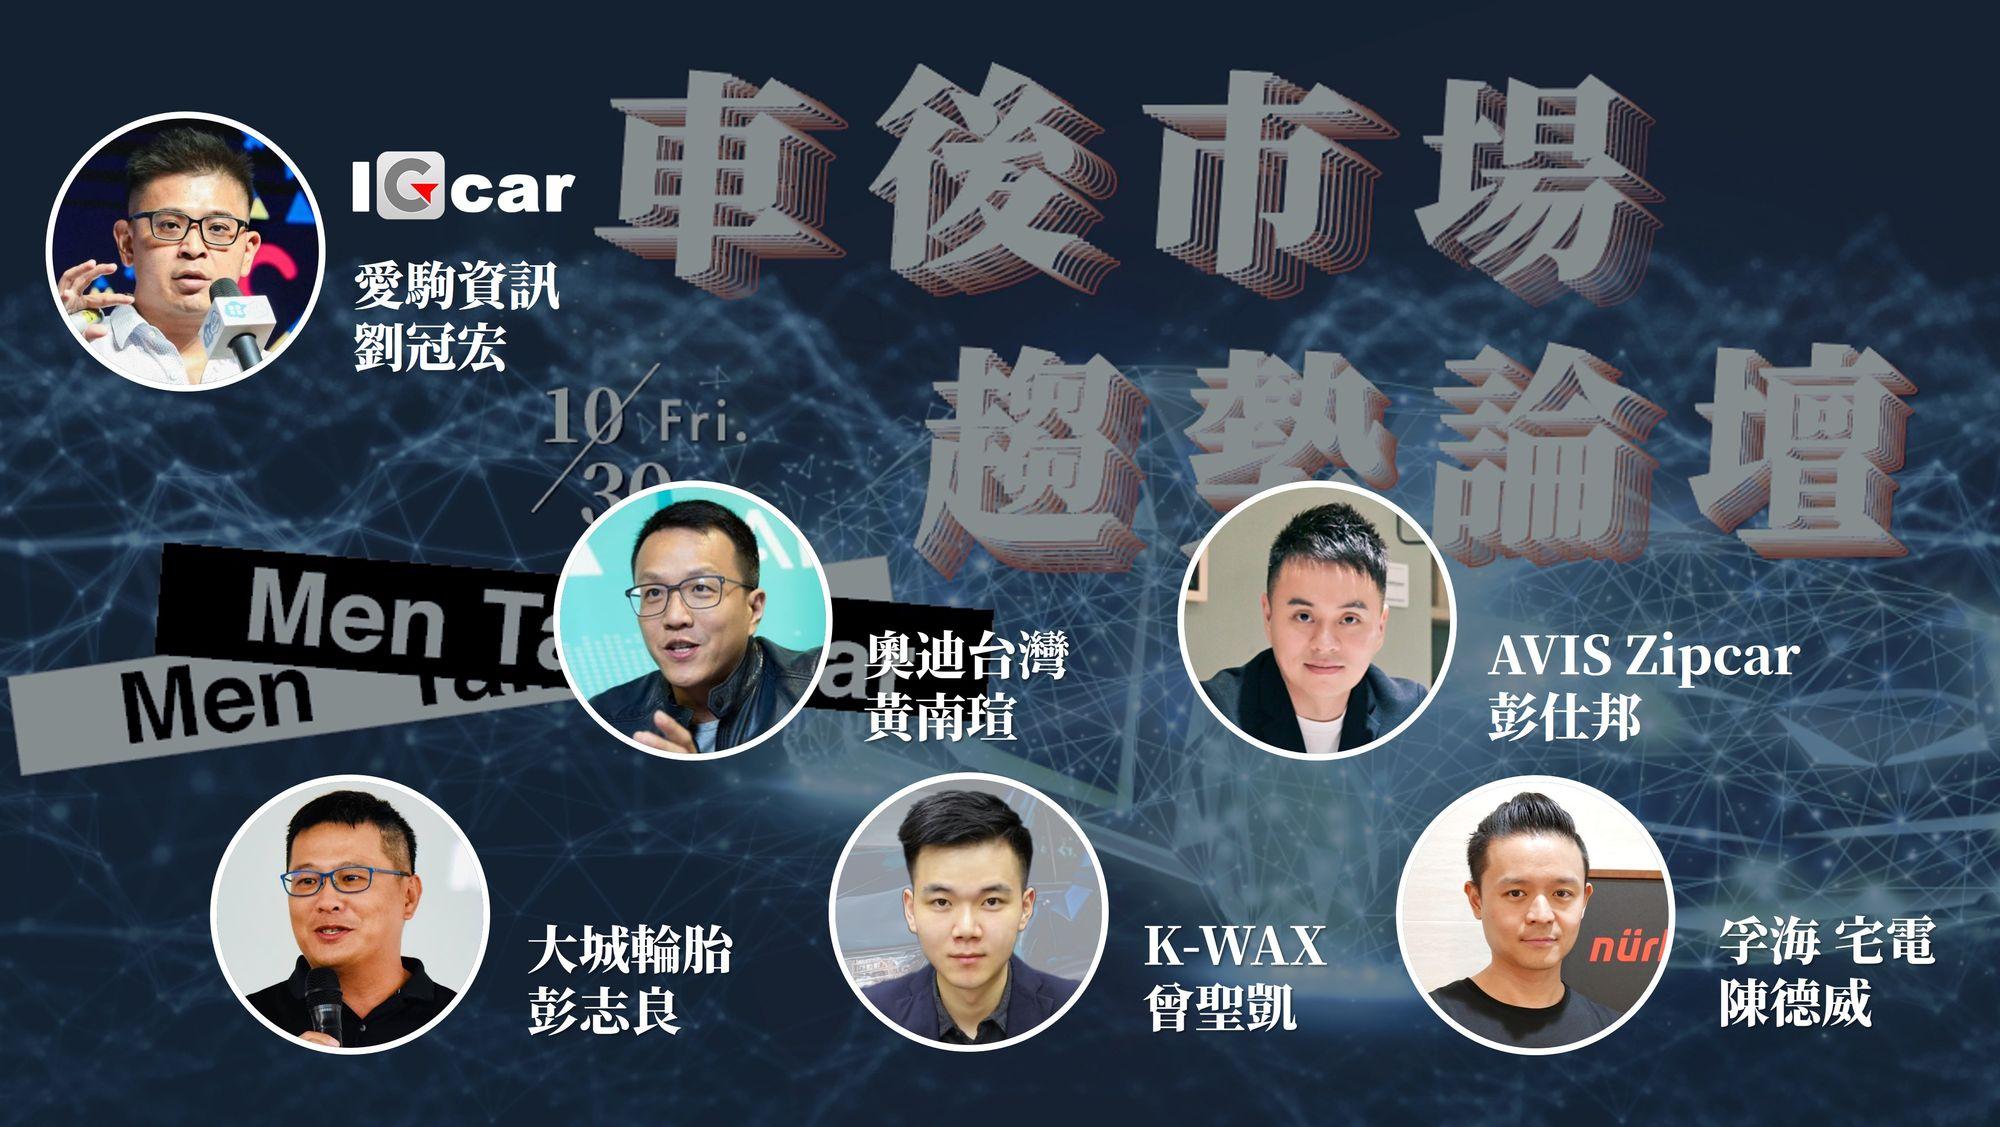 IGcar 愛駒資訊 汽車服務 Audi AVIS 大城輪胎 浮海 宅電 K-WAX